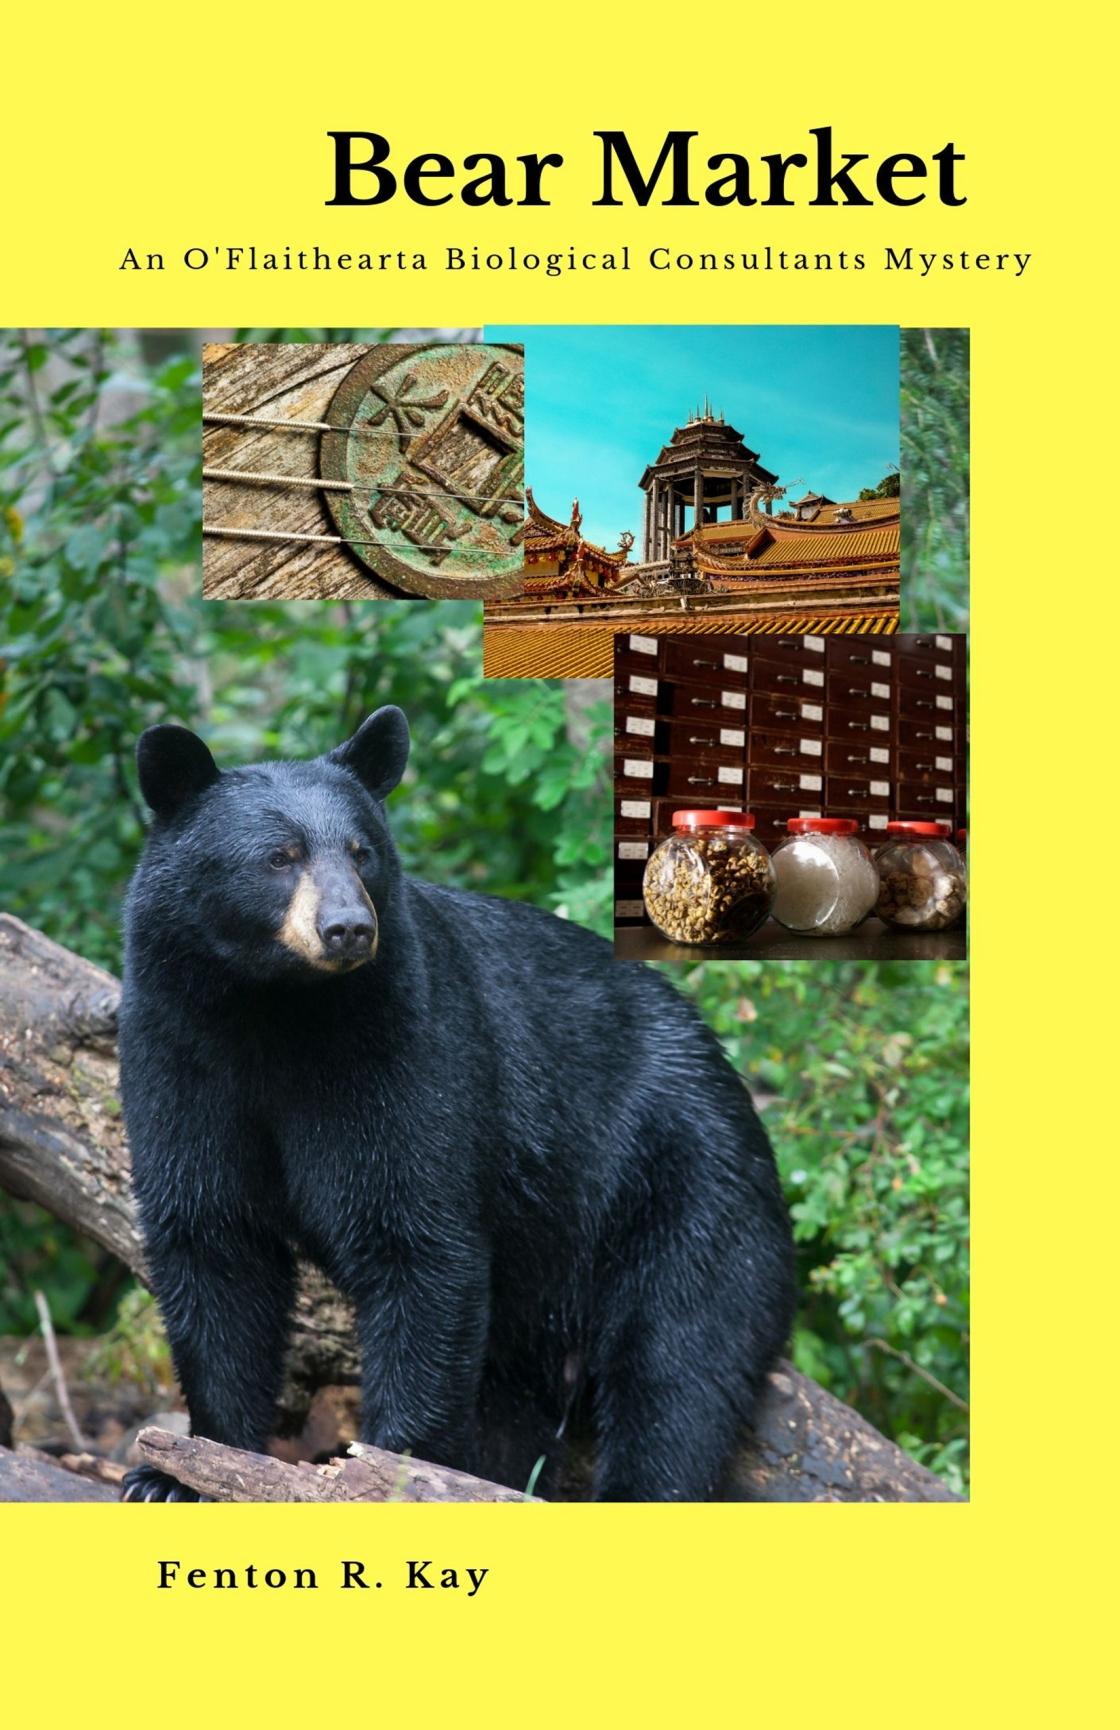 Bear Market-Cover-1